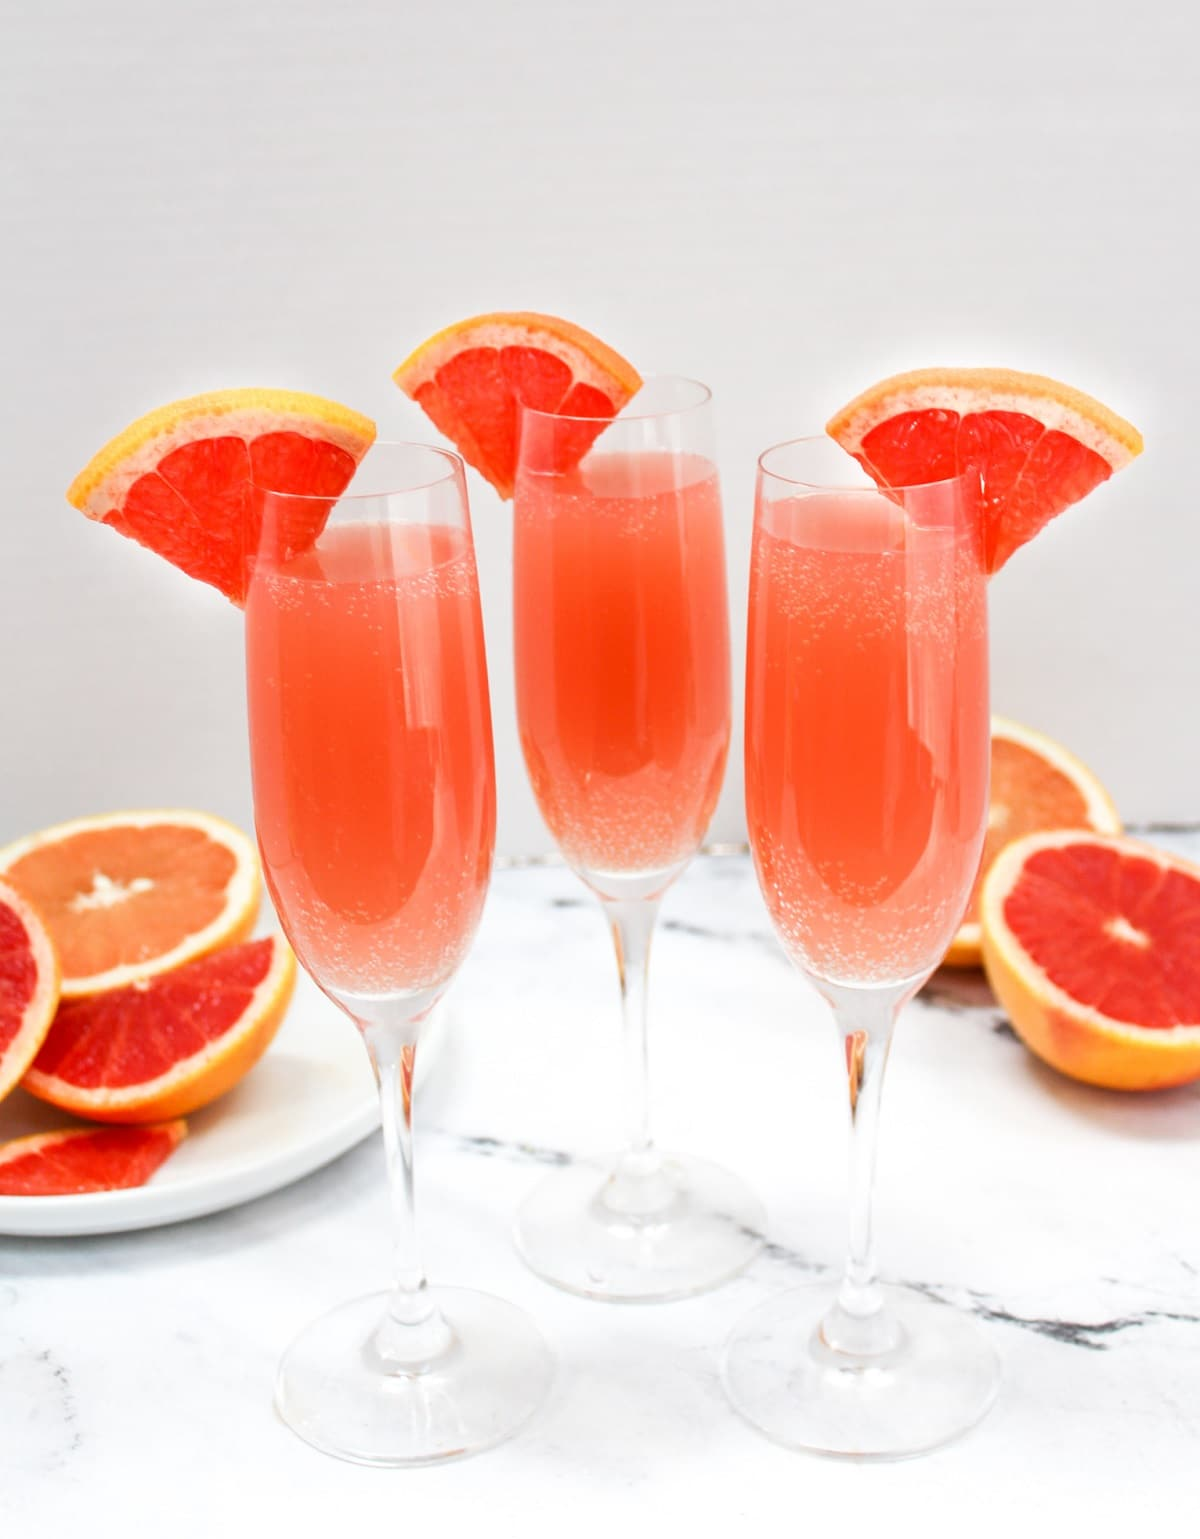 rose mimosas garnished with grapefruit slices